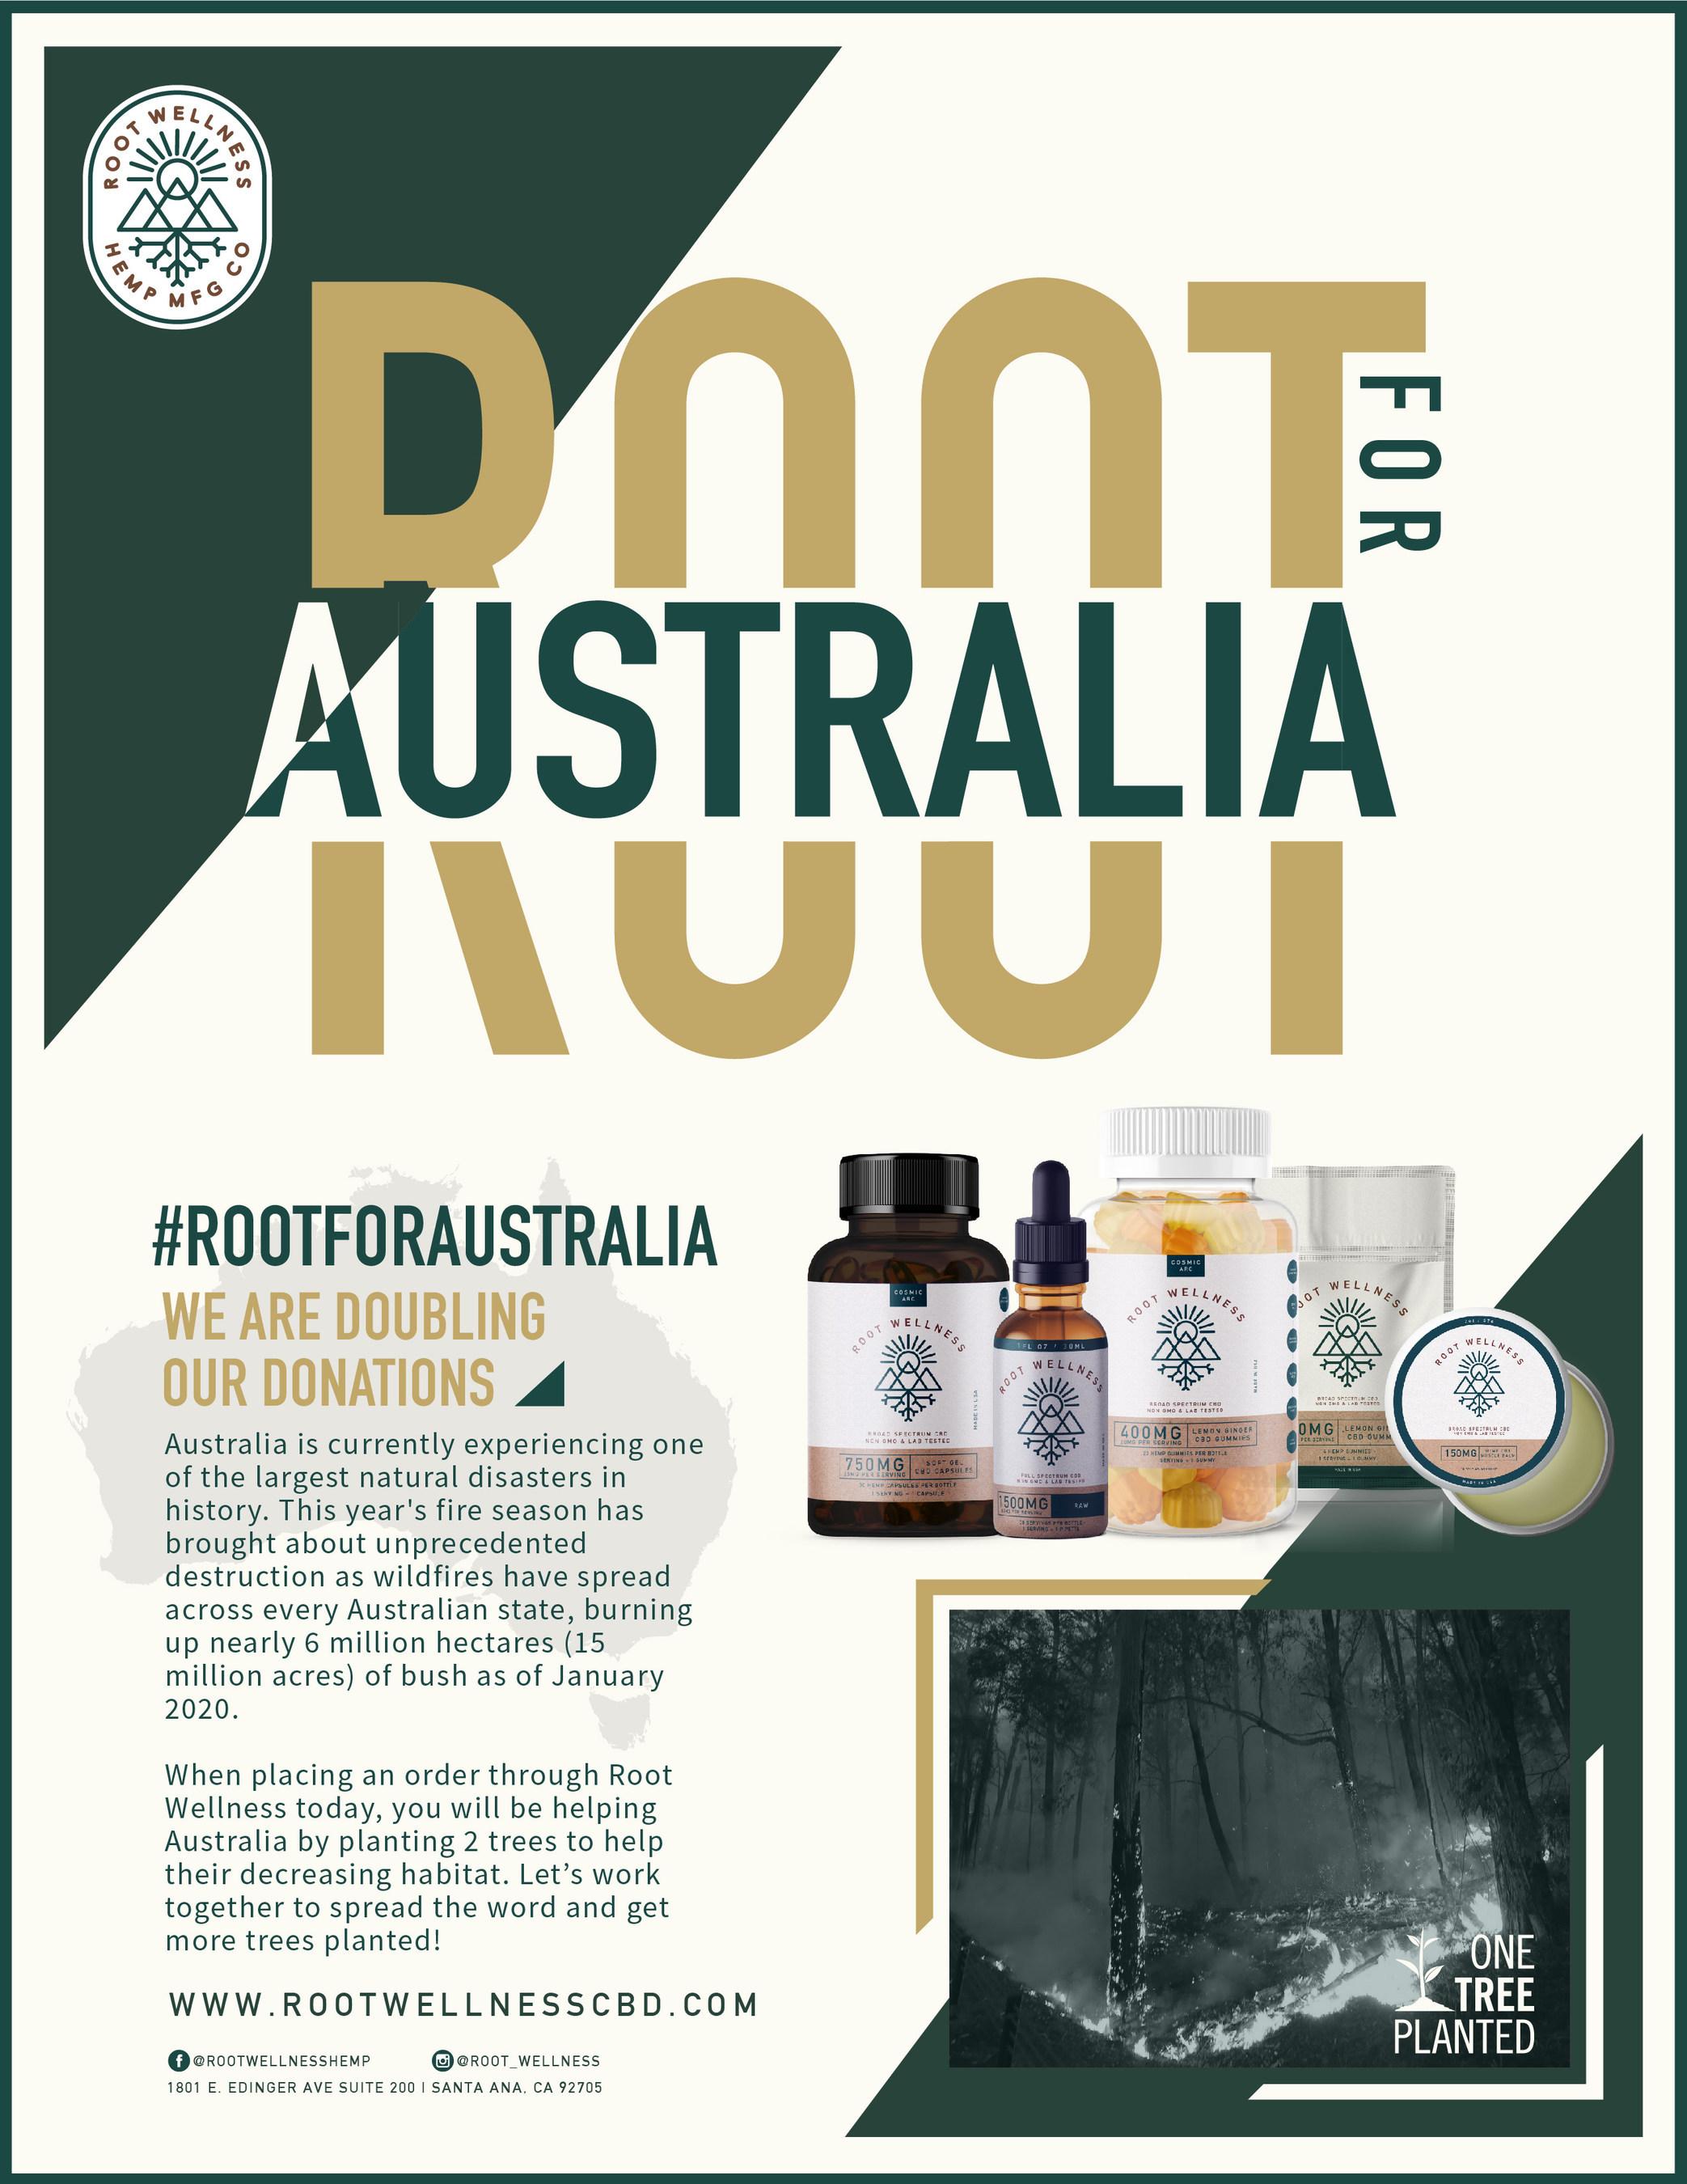 Root Wellness CBD's #ROOTFORAUSTRALIA reforestation campaign.